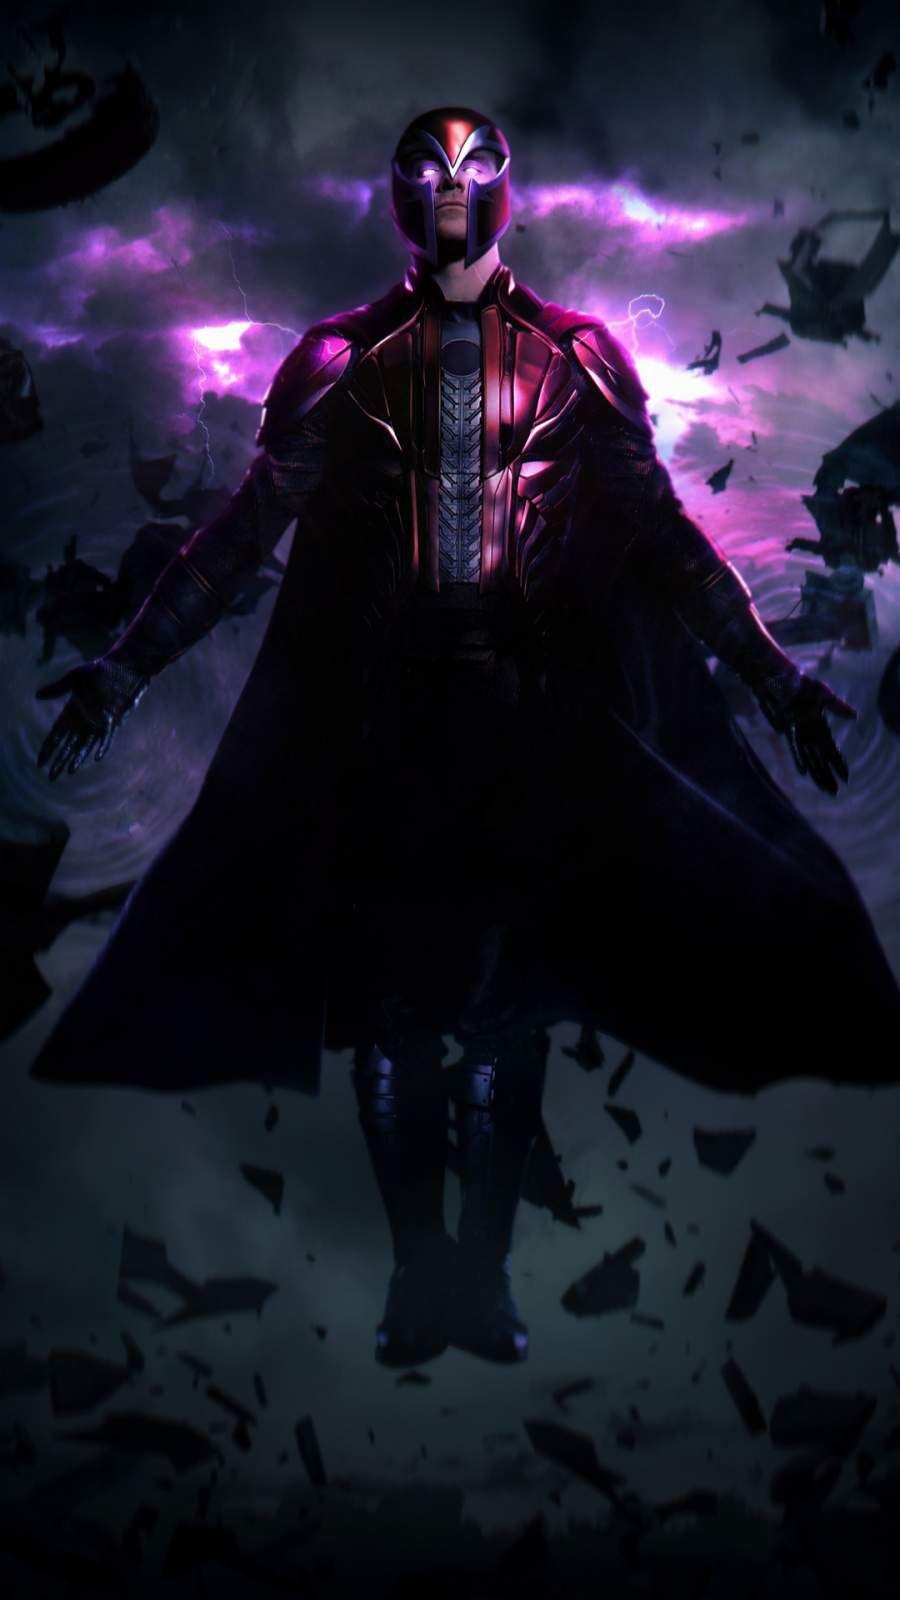 Magneto Artwork Iphone Wallpaper Marvel Superheroes Marvel Comics Art Xmen